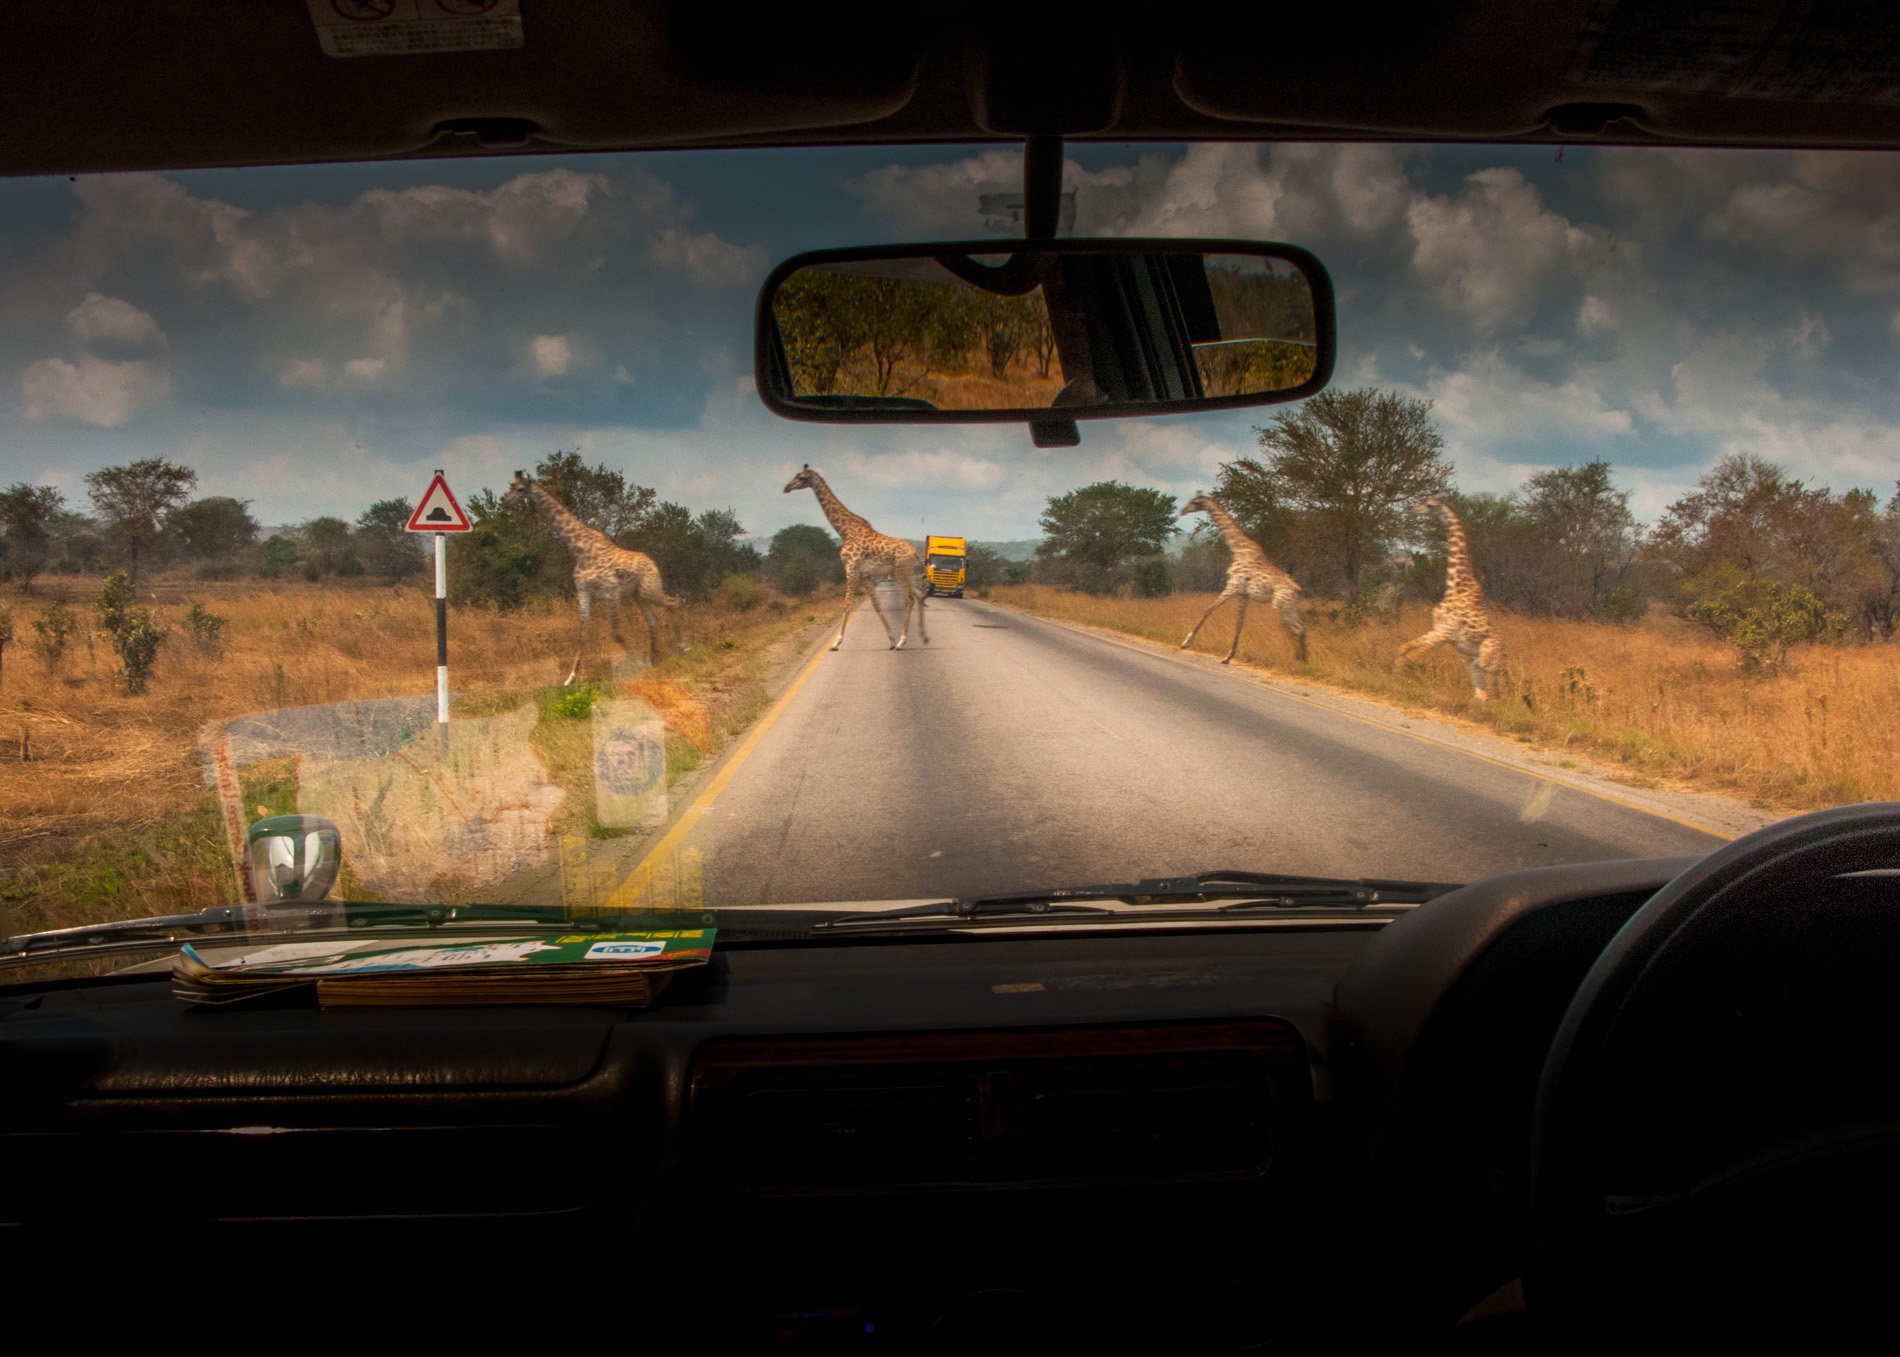 Tanzania,_Back_Seat_View-1728.jpg